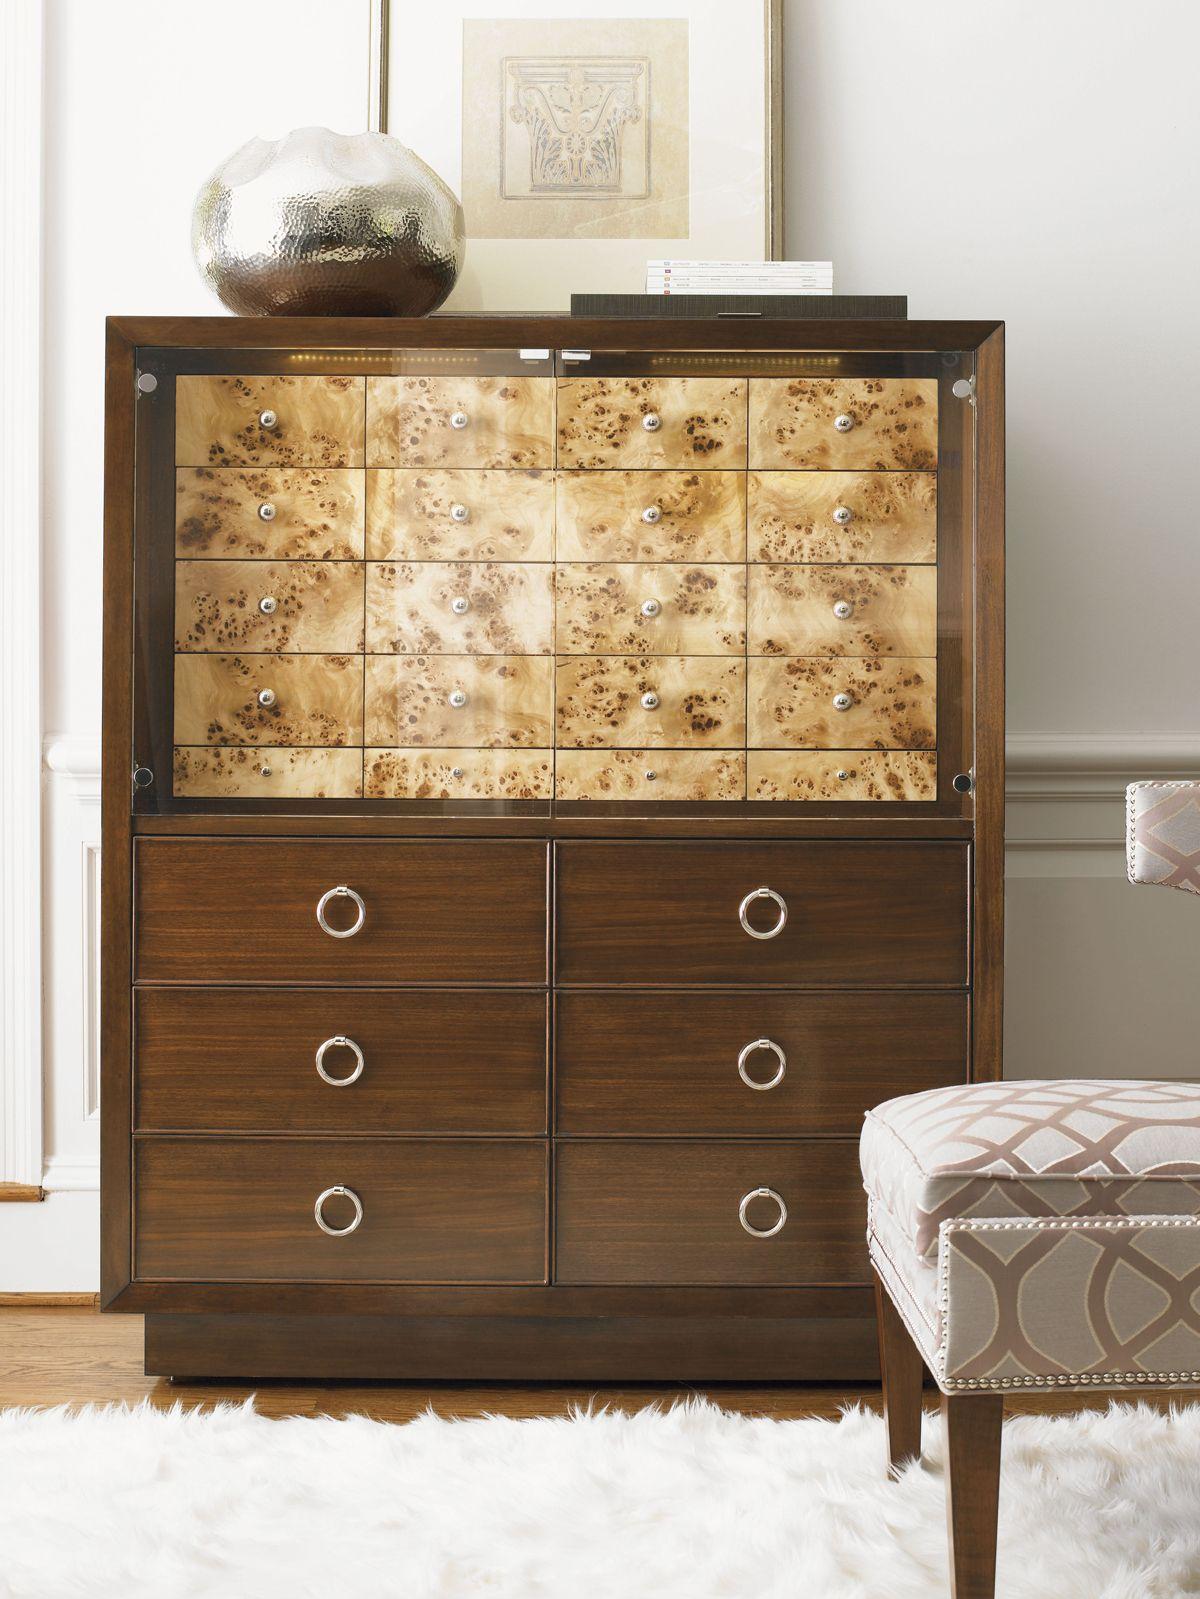 Mirage brando gentlemans chest lexington home brands furnishings